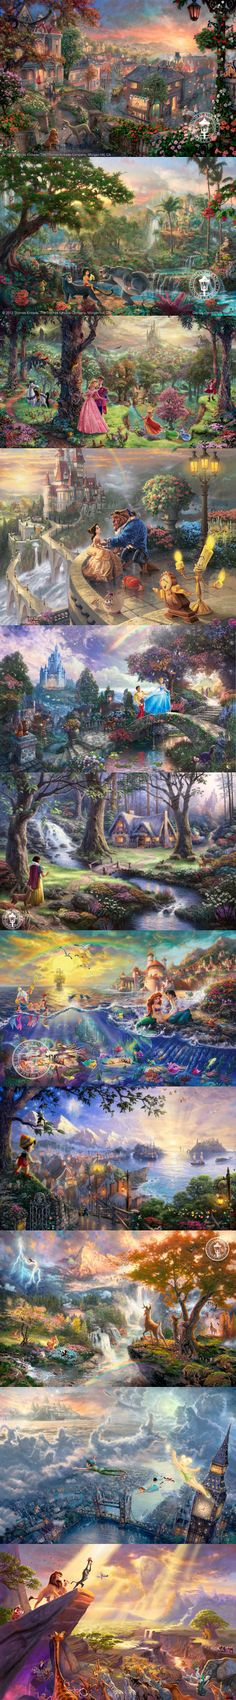 Thomas Kinkade's Disney Landscapes :)